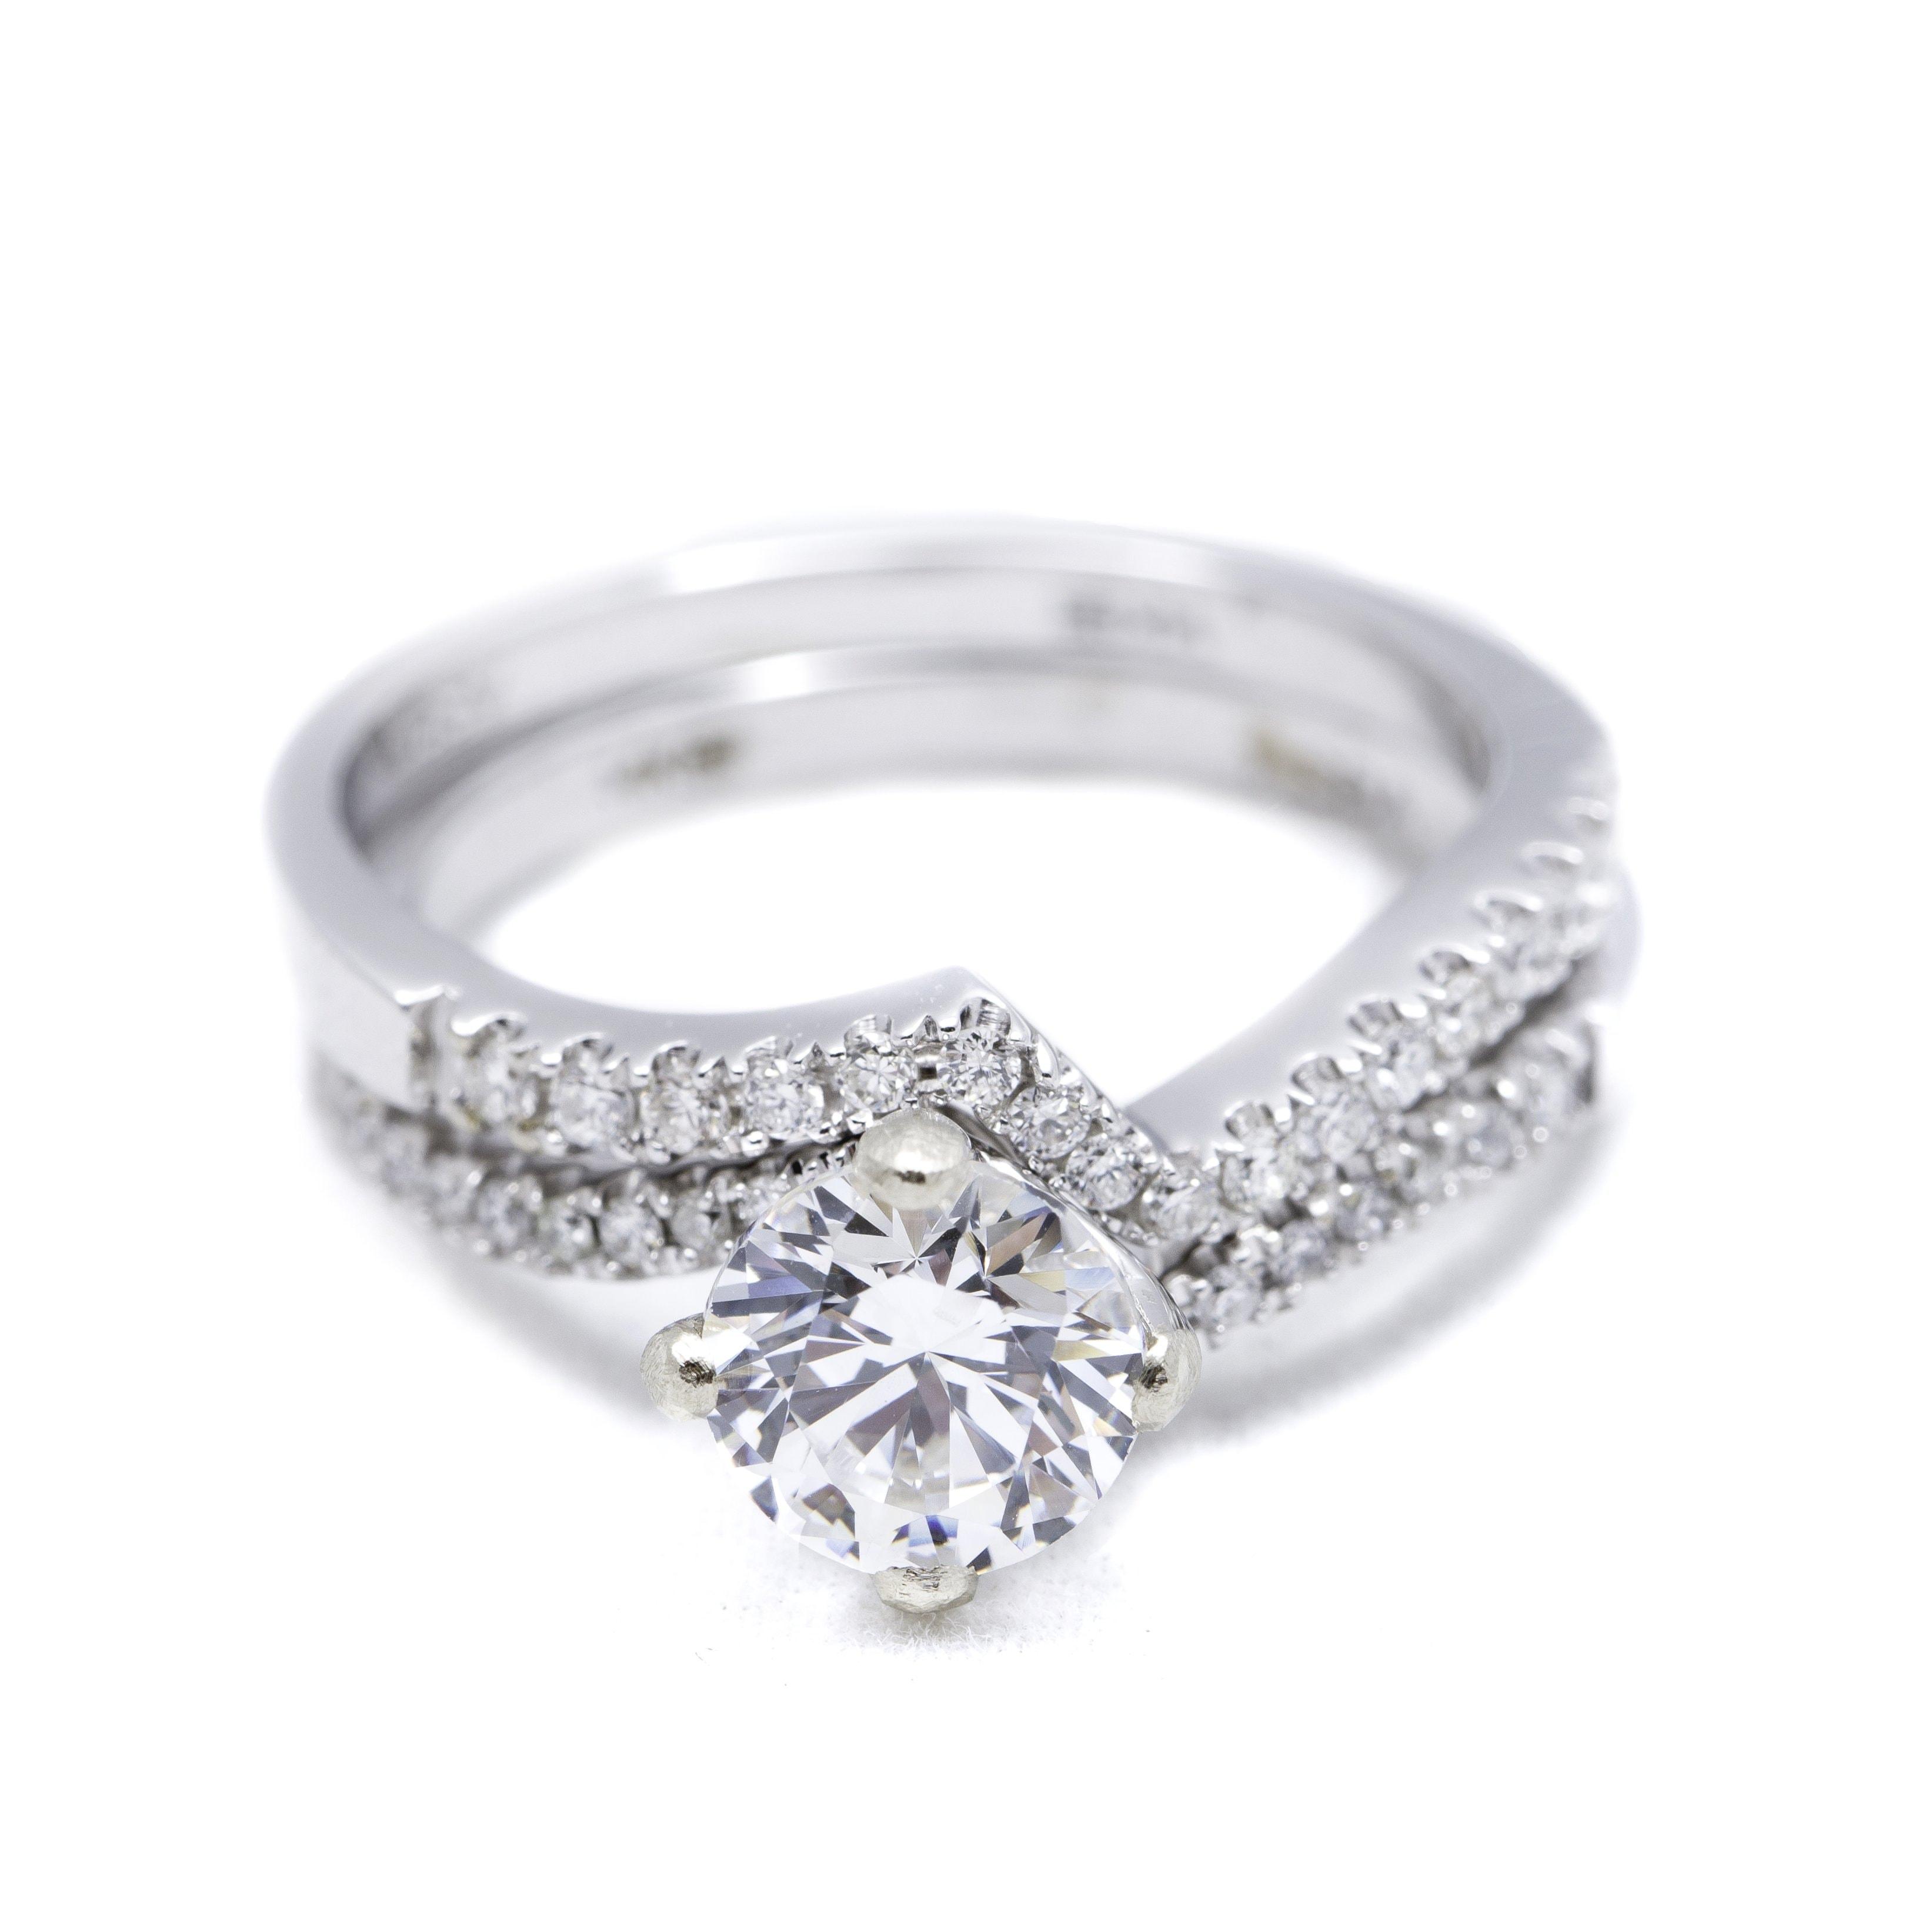 White Gold Diamond Ring Mounting And Wedding Ring Set Argo Lehne Jewelers